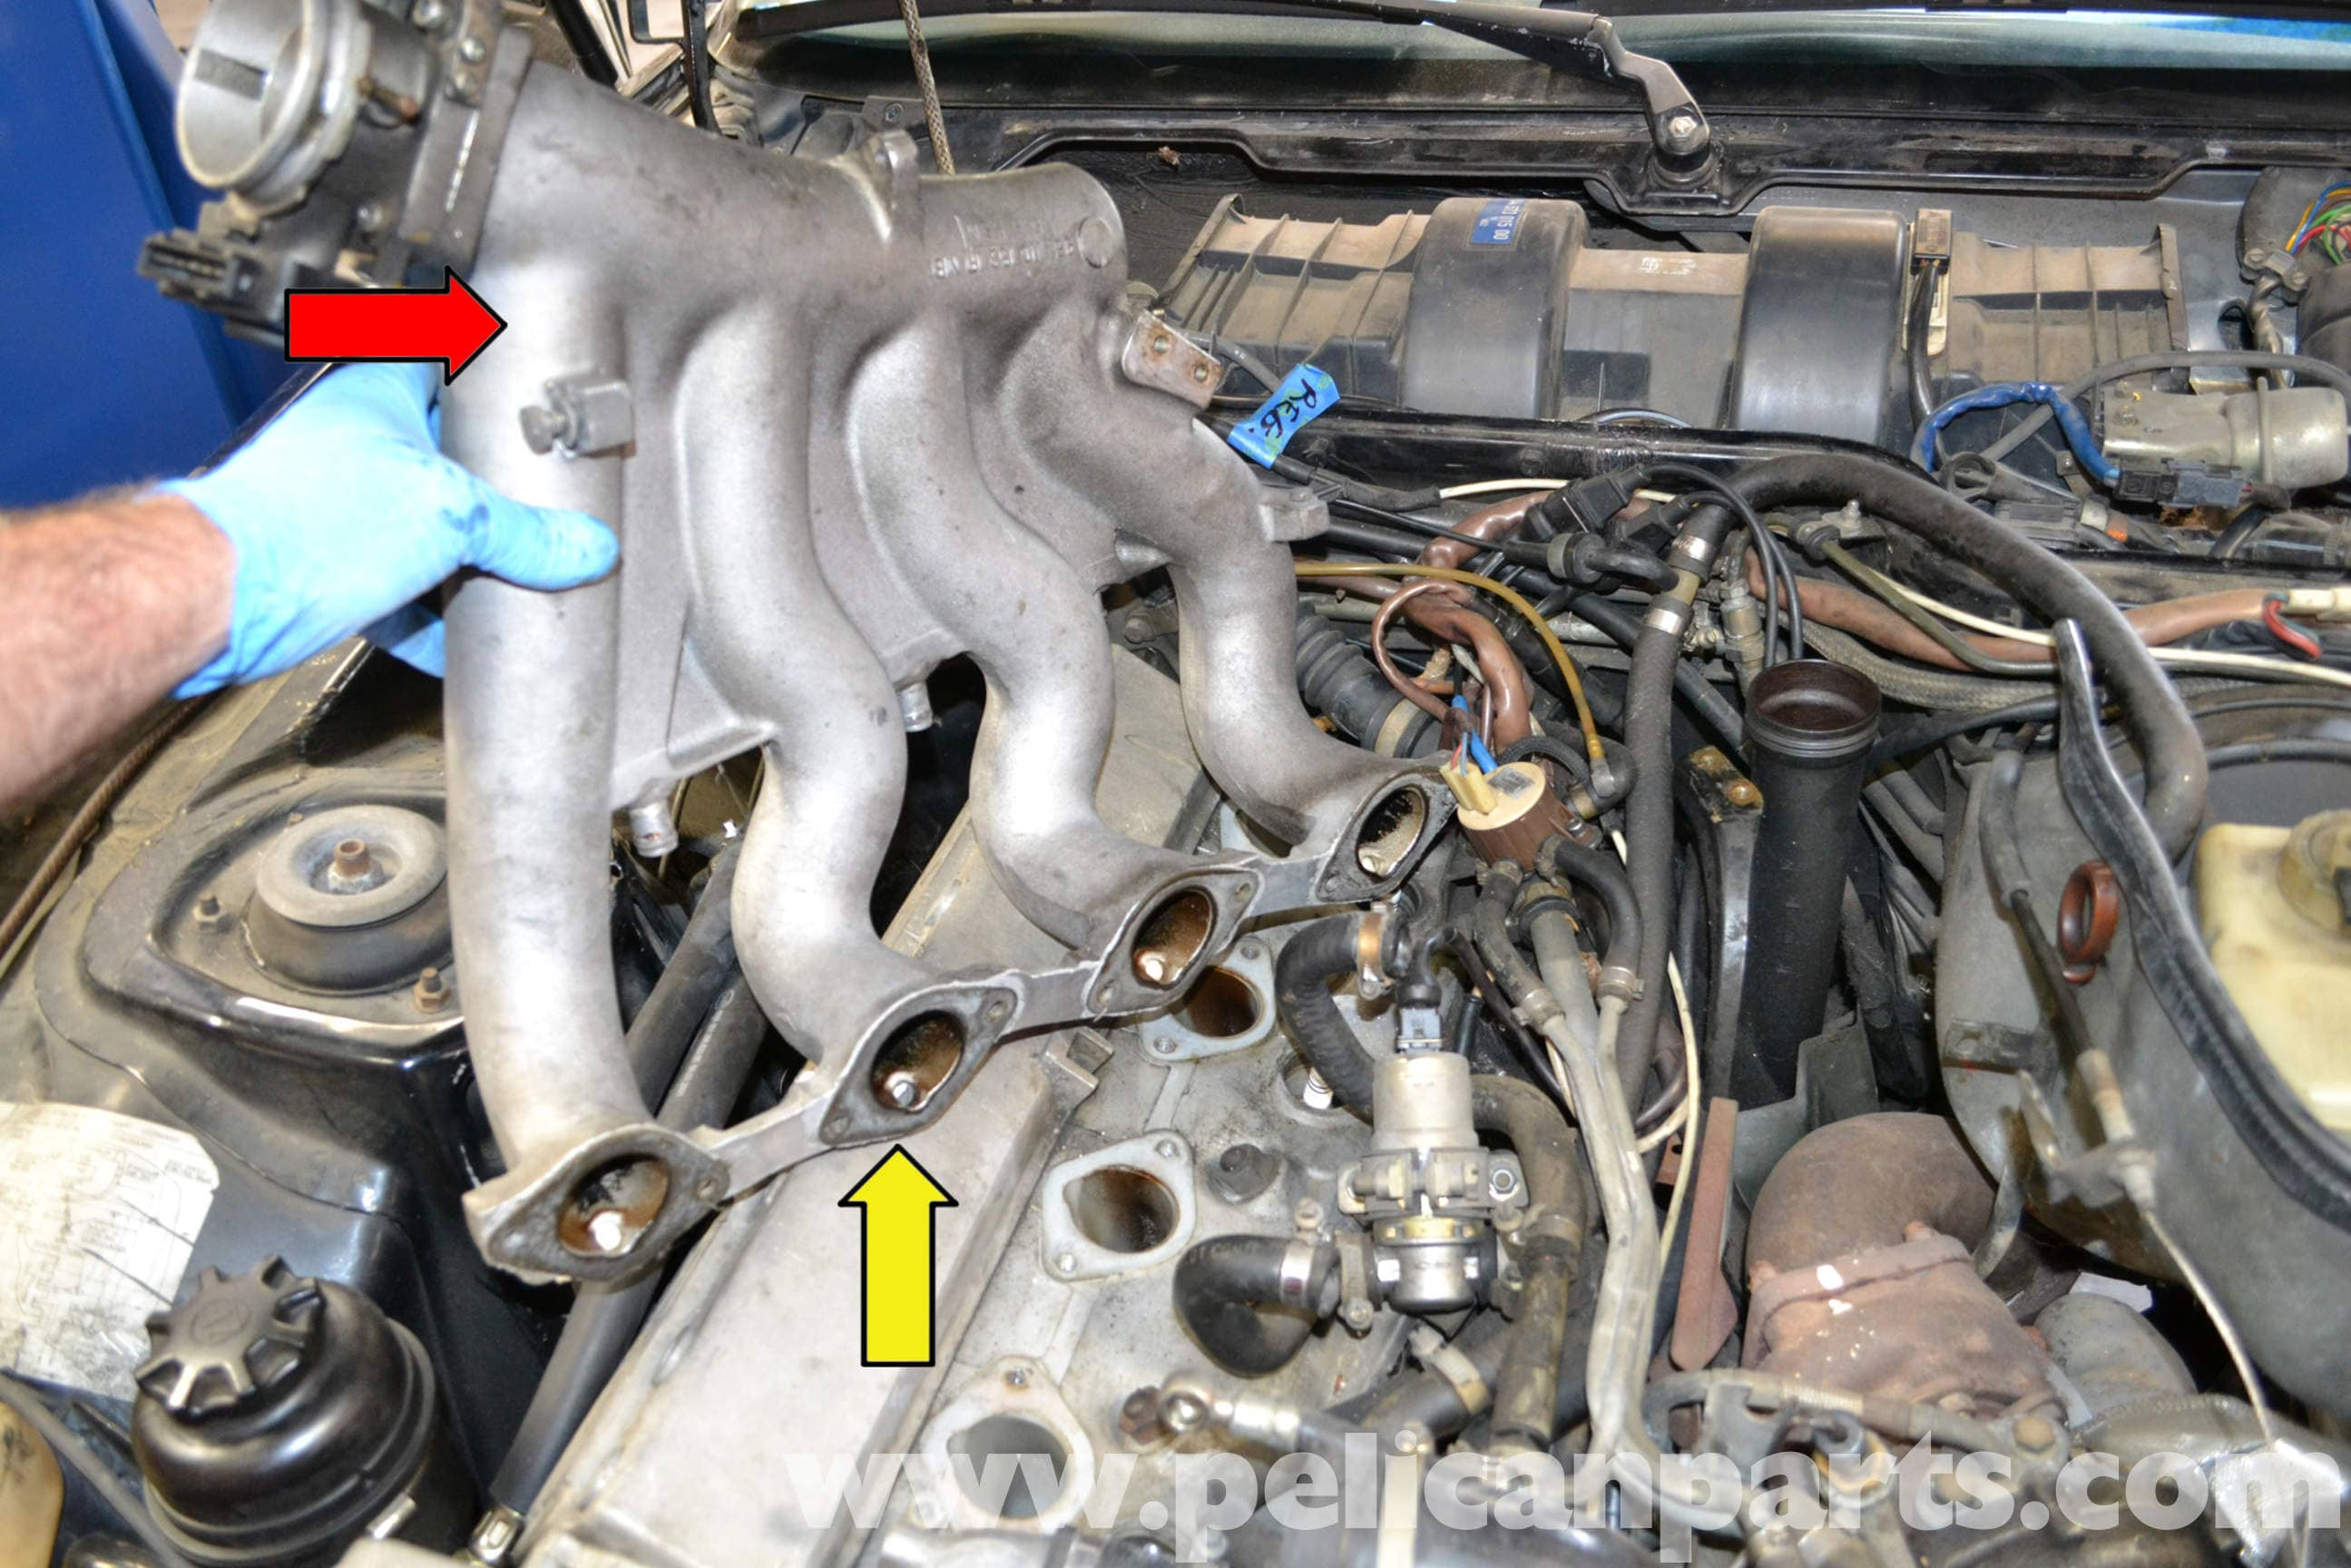 Porsche 944 Intake Diagram Download Wiring Diagrams \u2022 Mitsubishi  Precis Engine Diagram Diagram Of 1986 Porsche 944 Turbo Engine